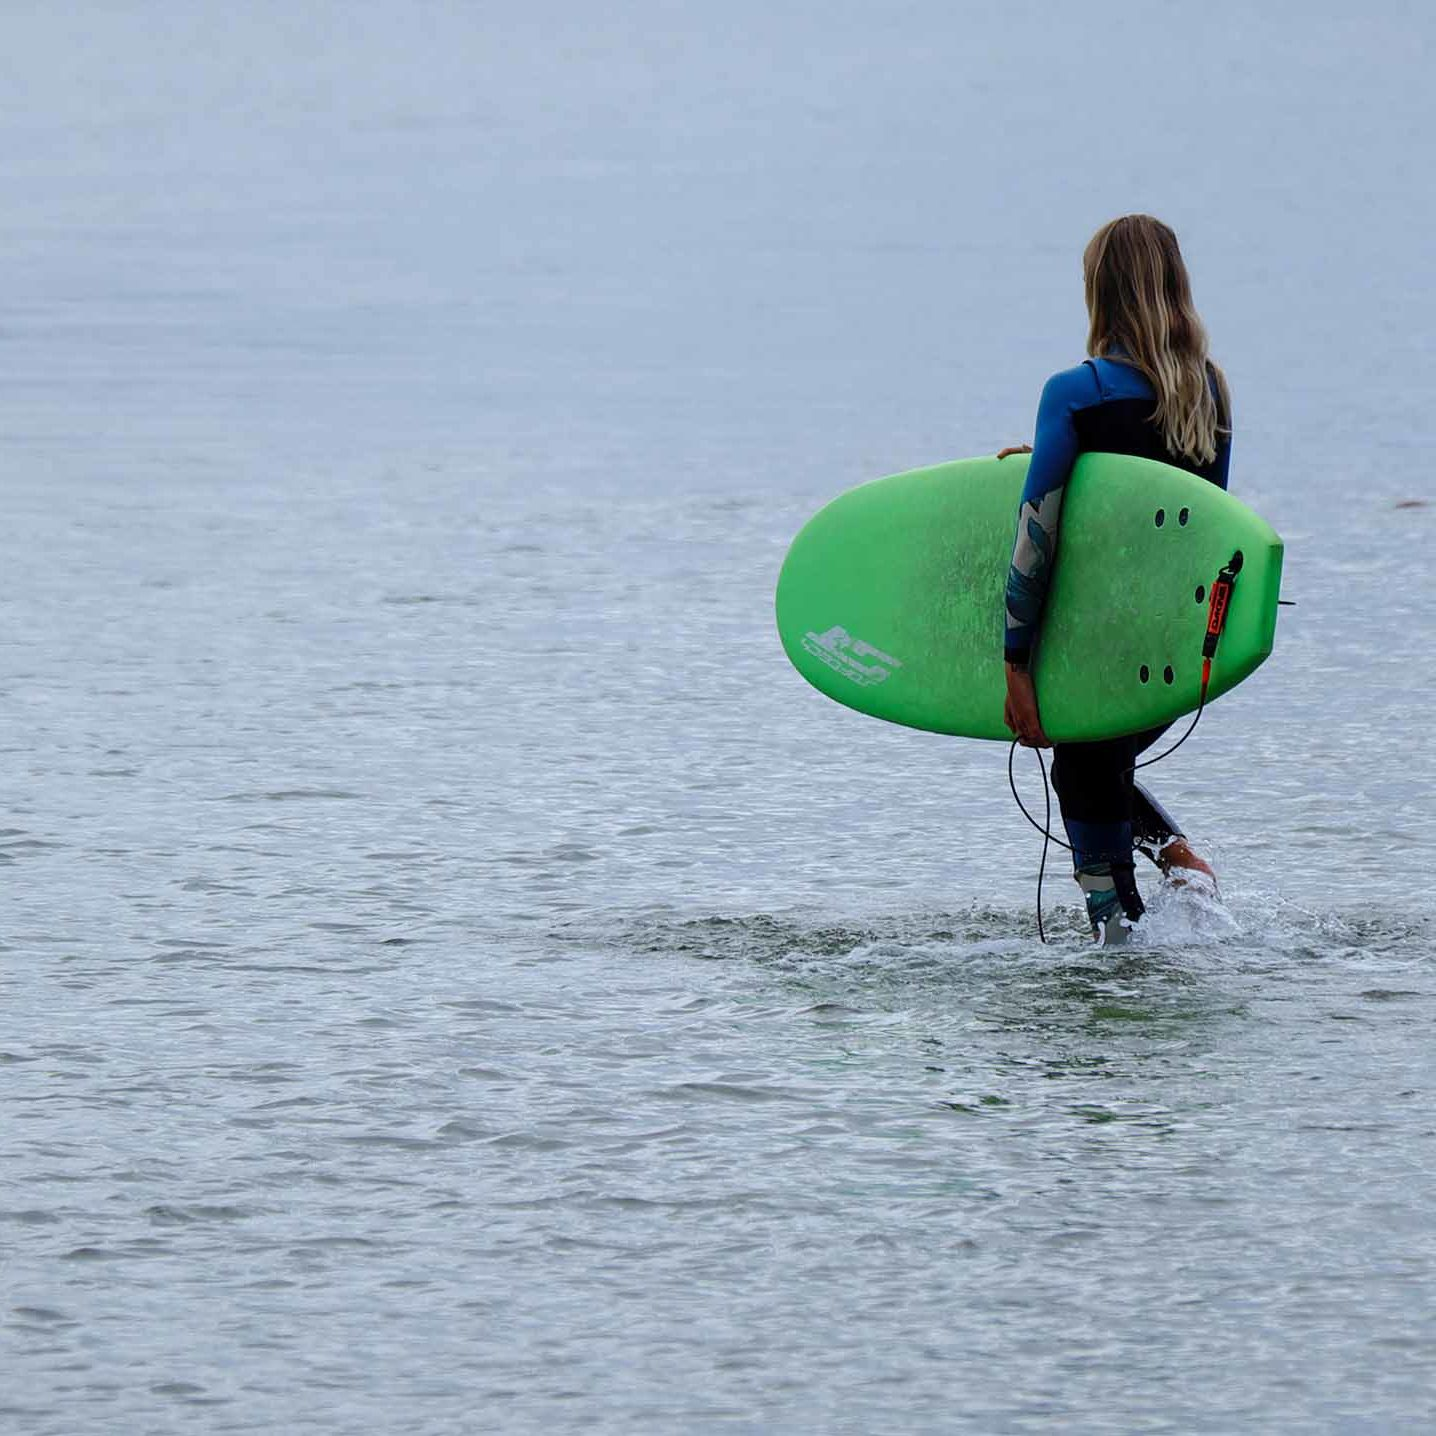 beginner-surf-lesson-las-palmas